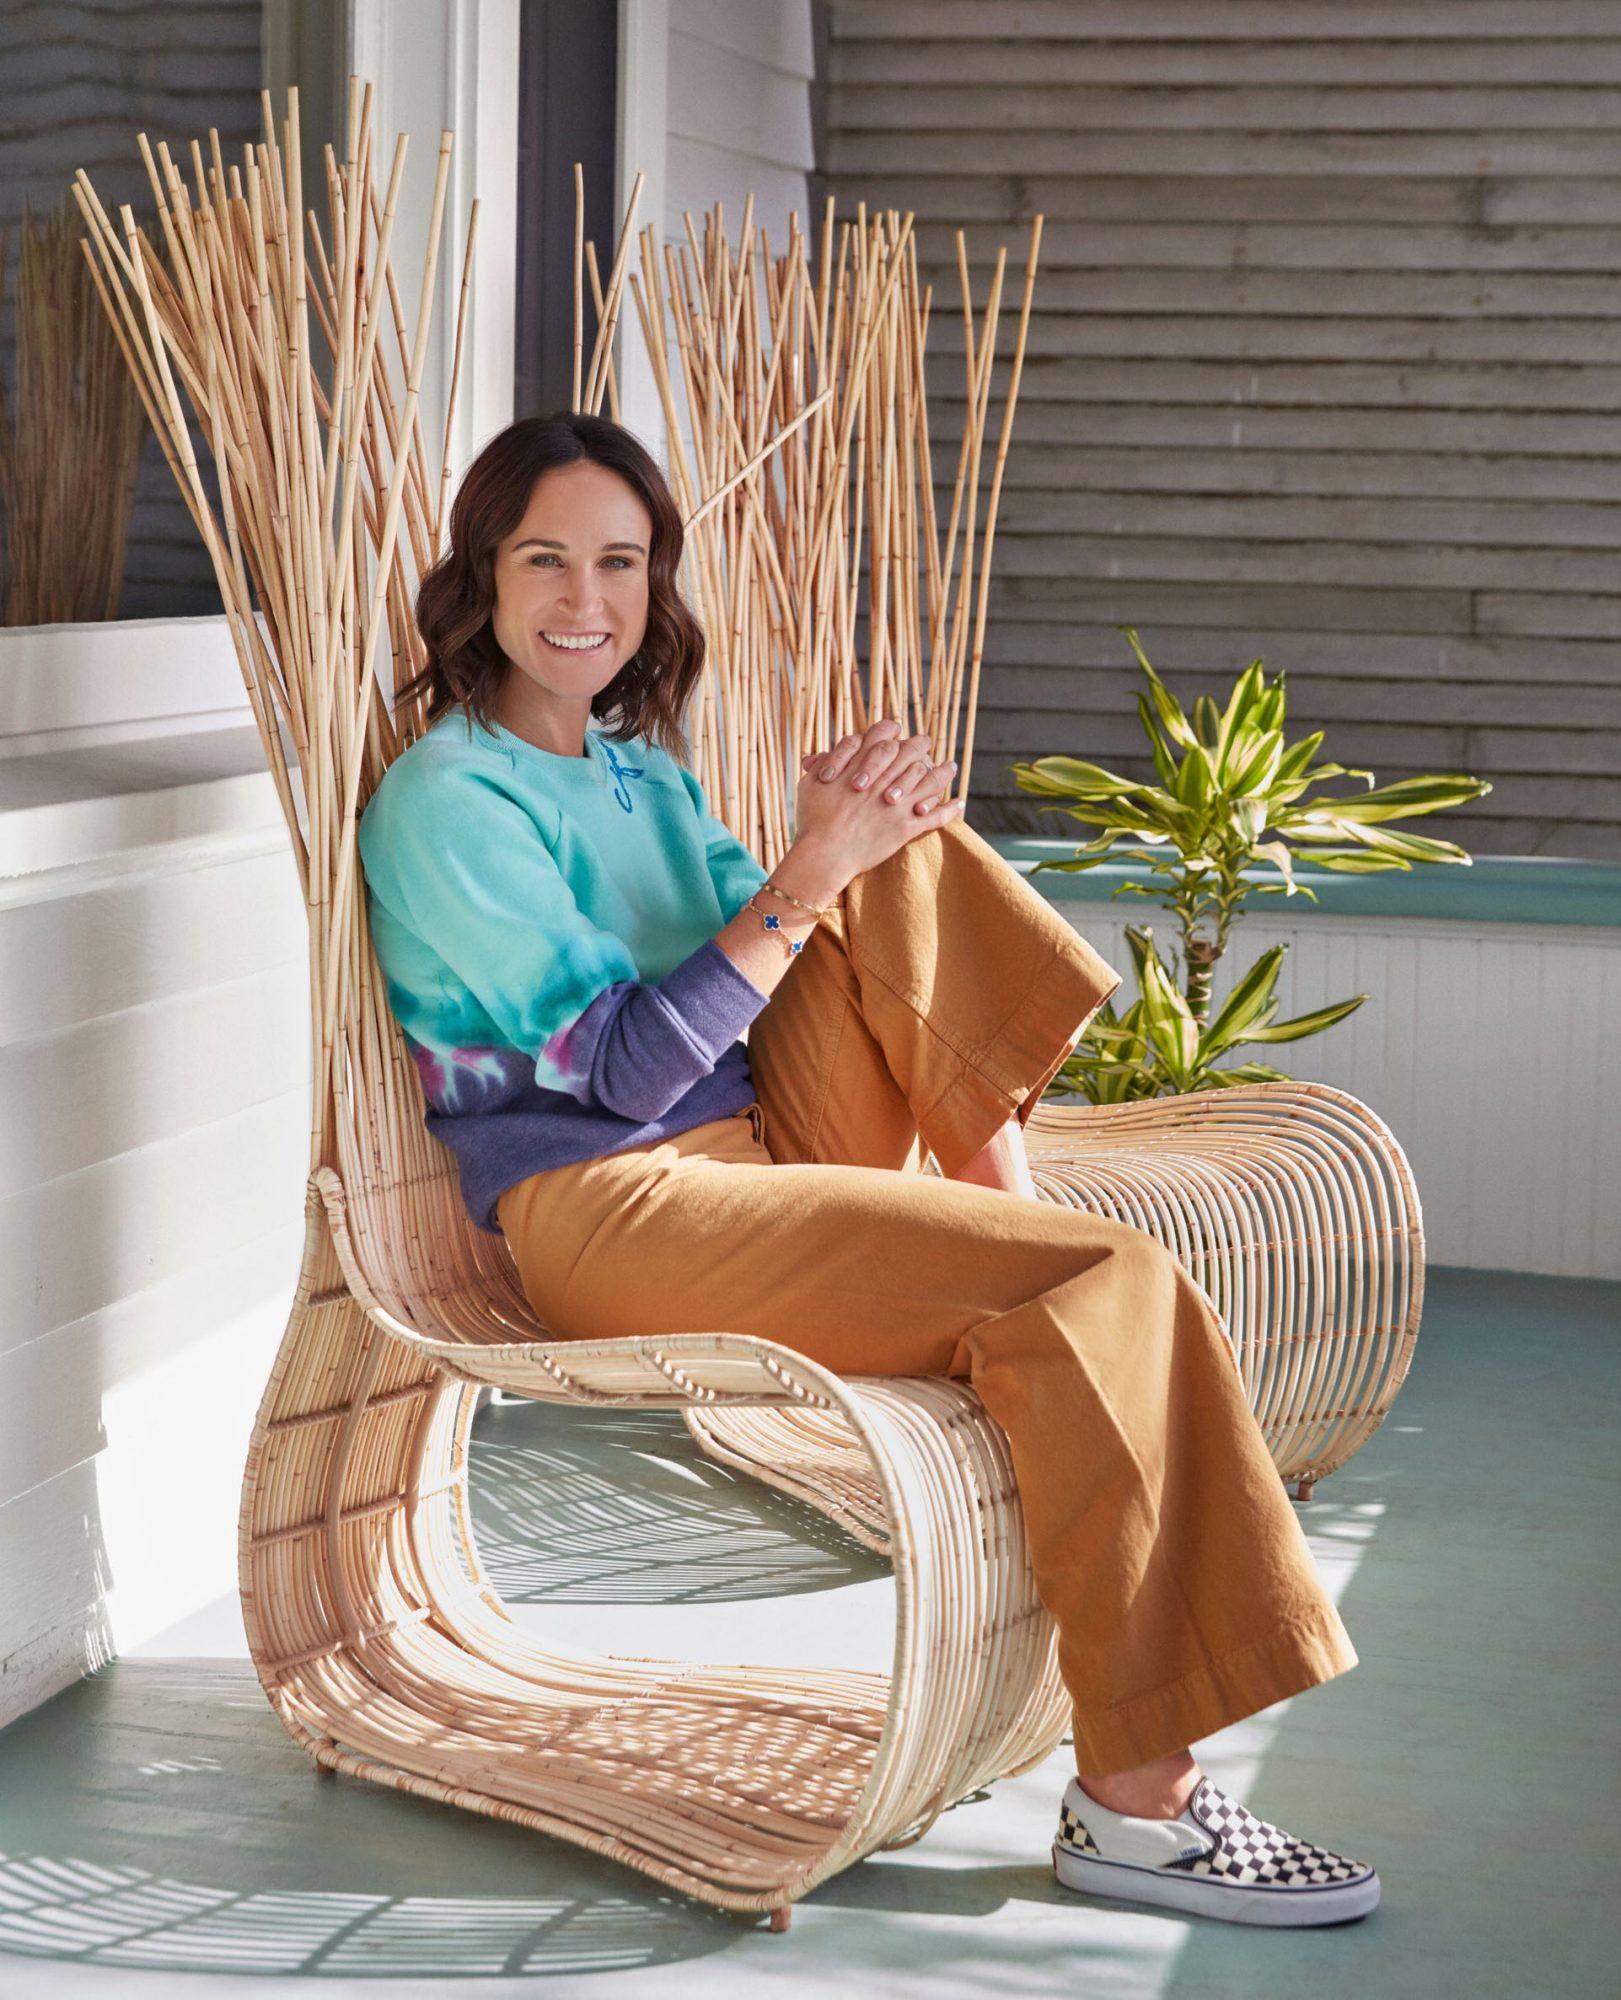 melissa akkaway sitting on rattan chair on front porch